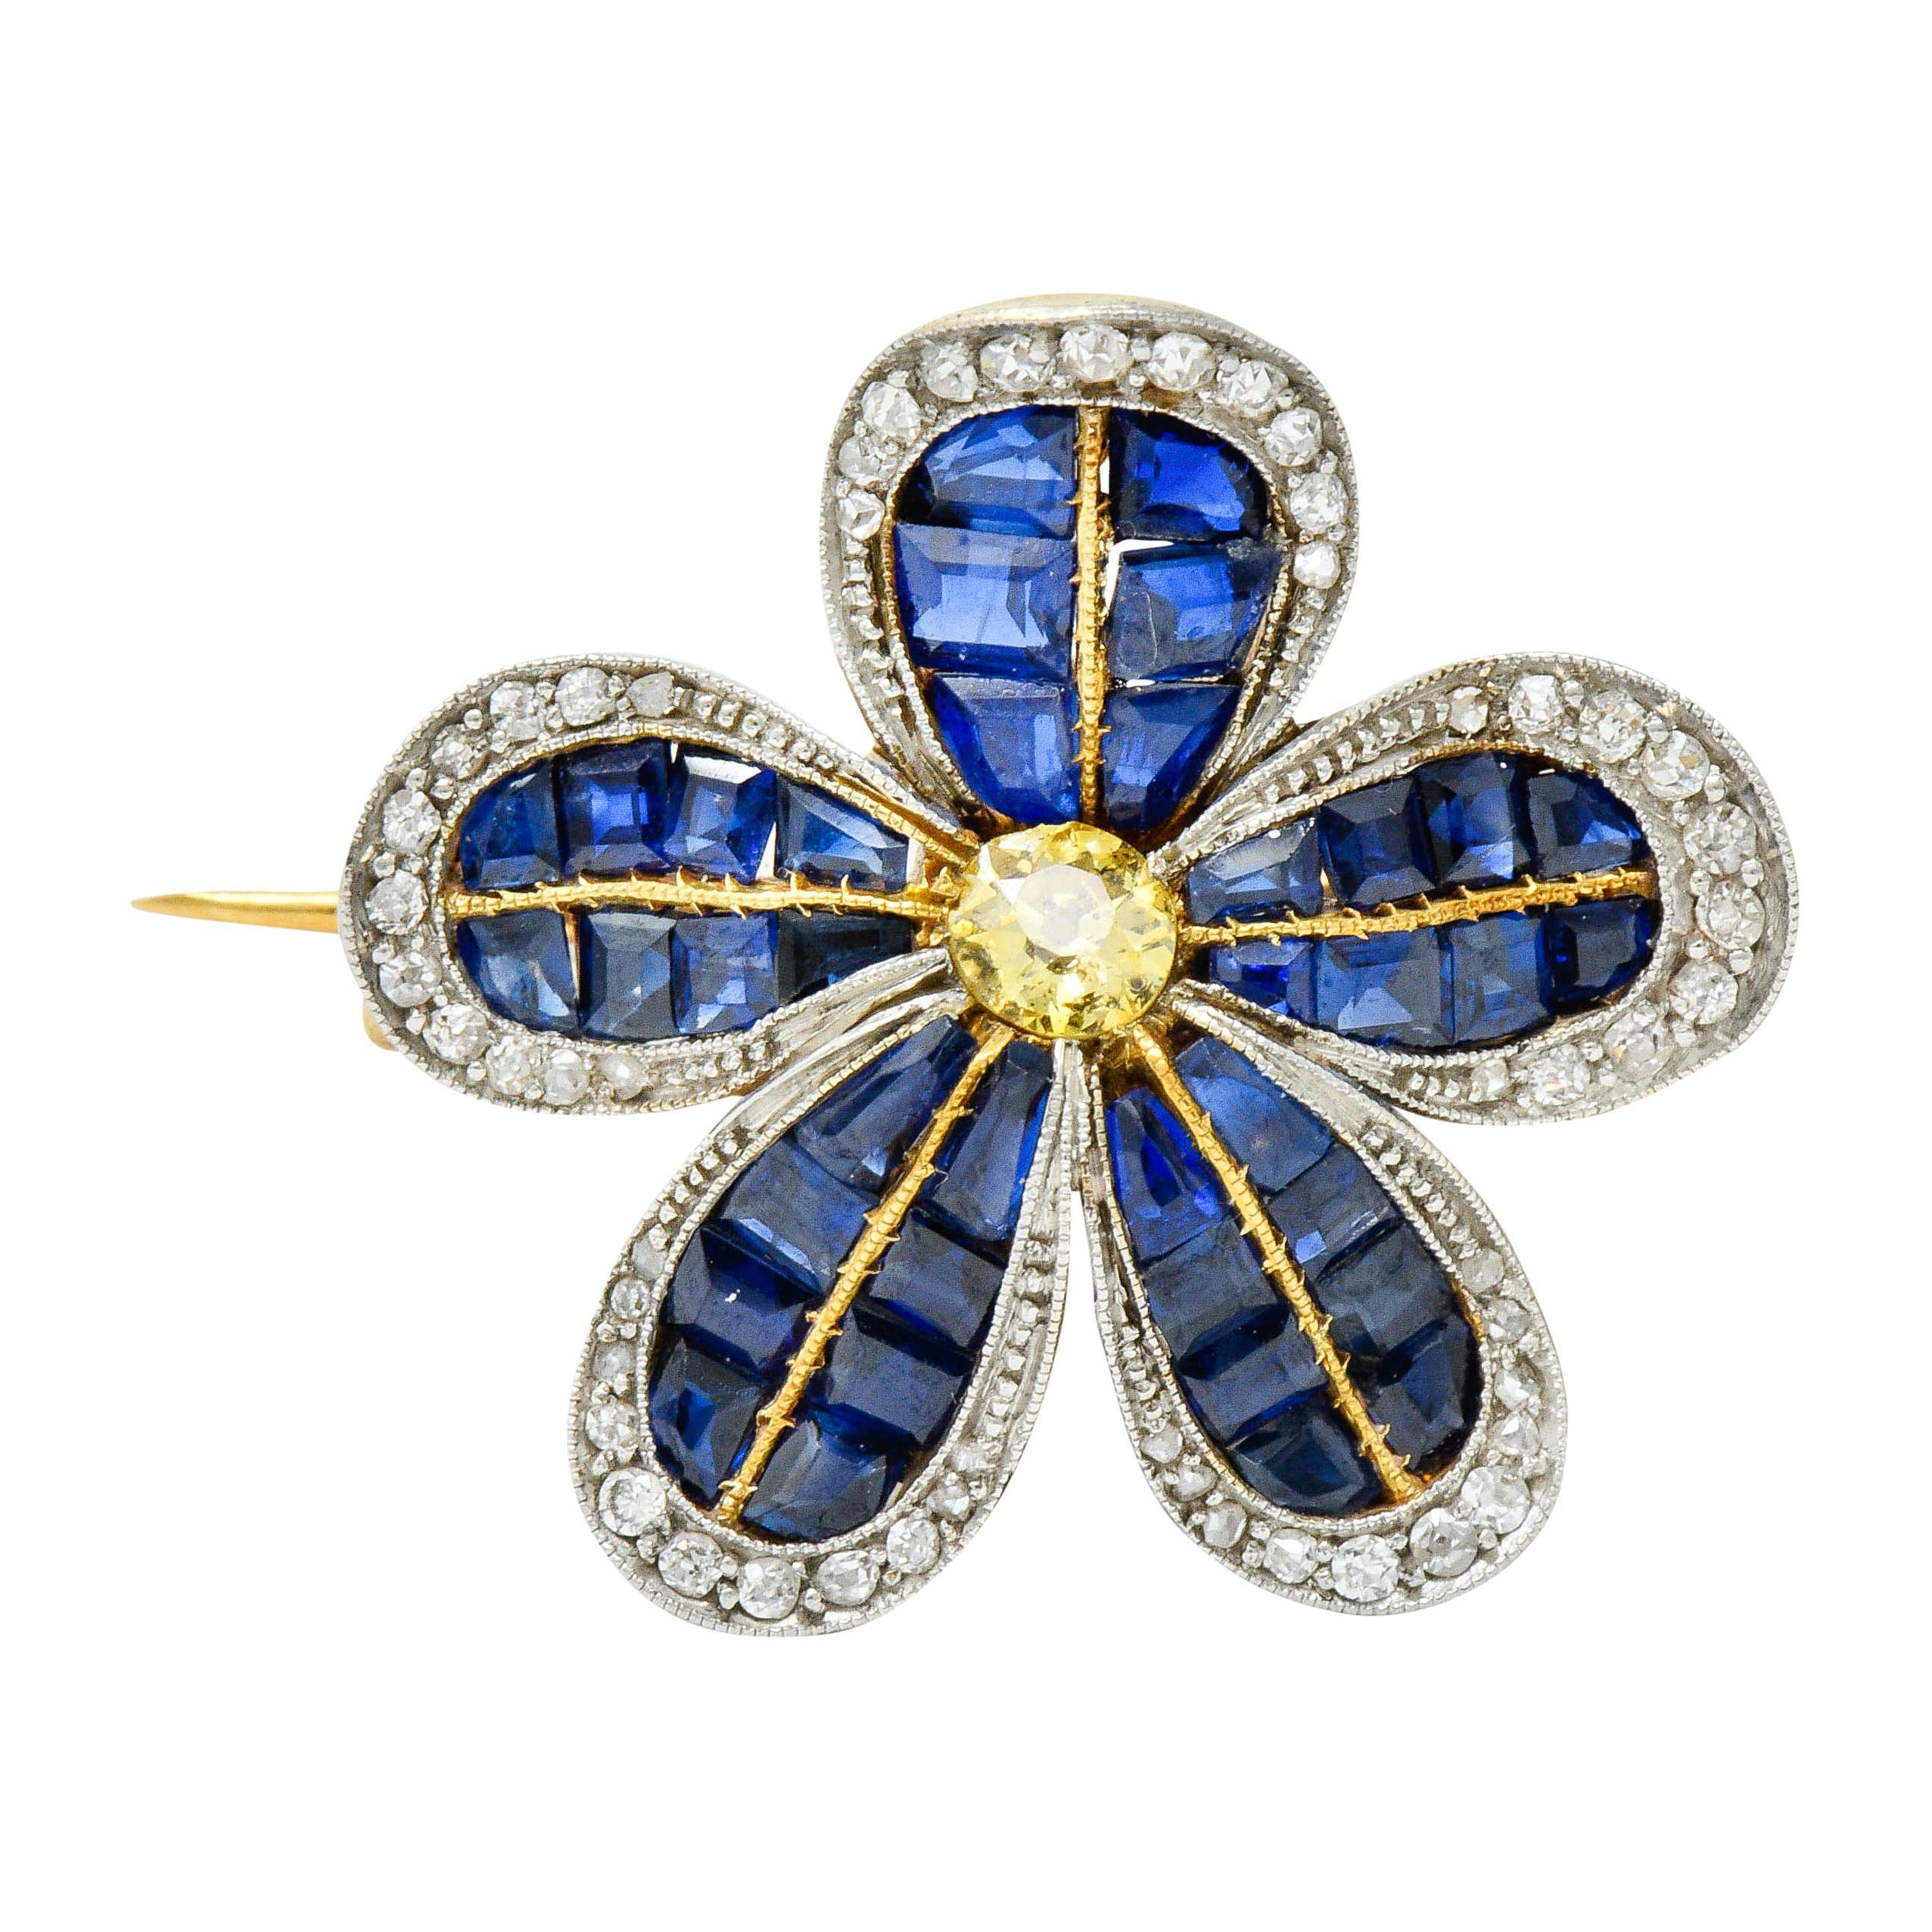 Edwardian 4.32 Carat Sapphire Fancy Colored Diamond Platinum 18 Karat Gold Pin